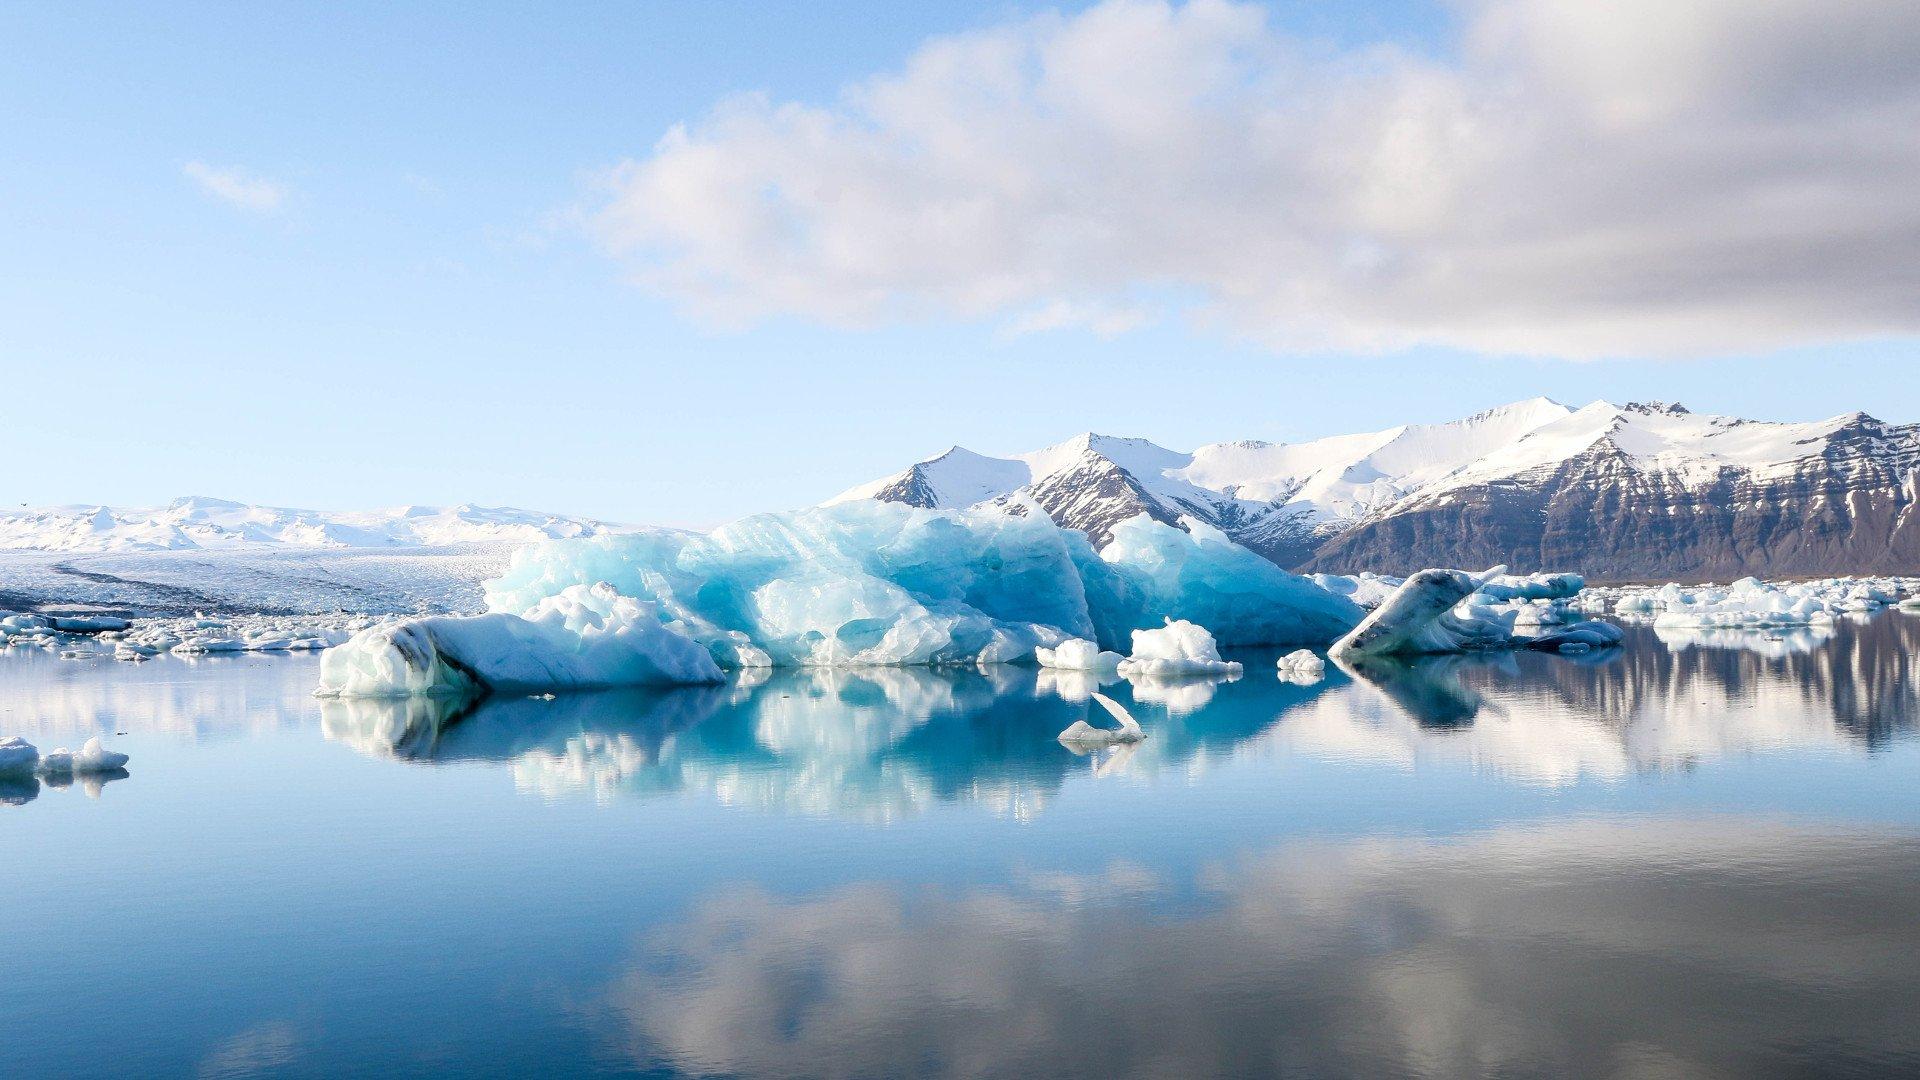 Iceberg reflection in Jokulsarlon